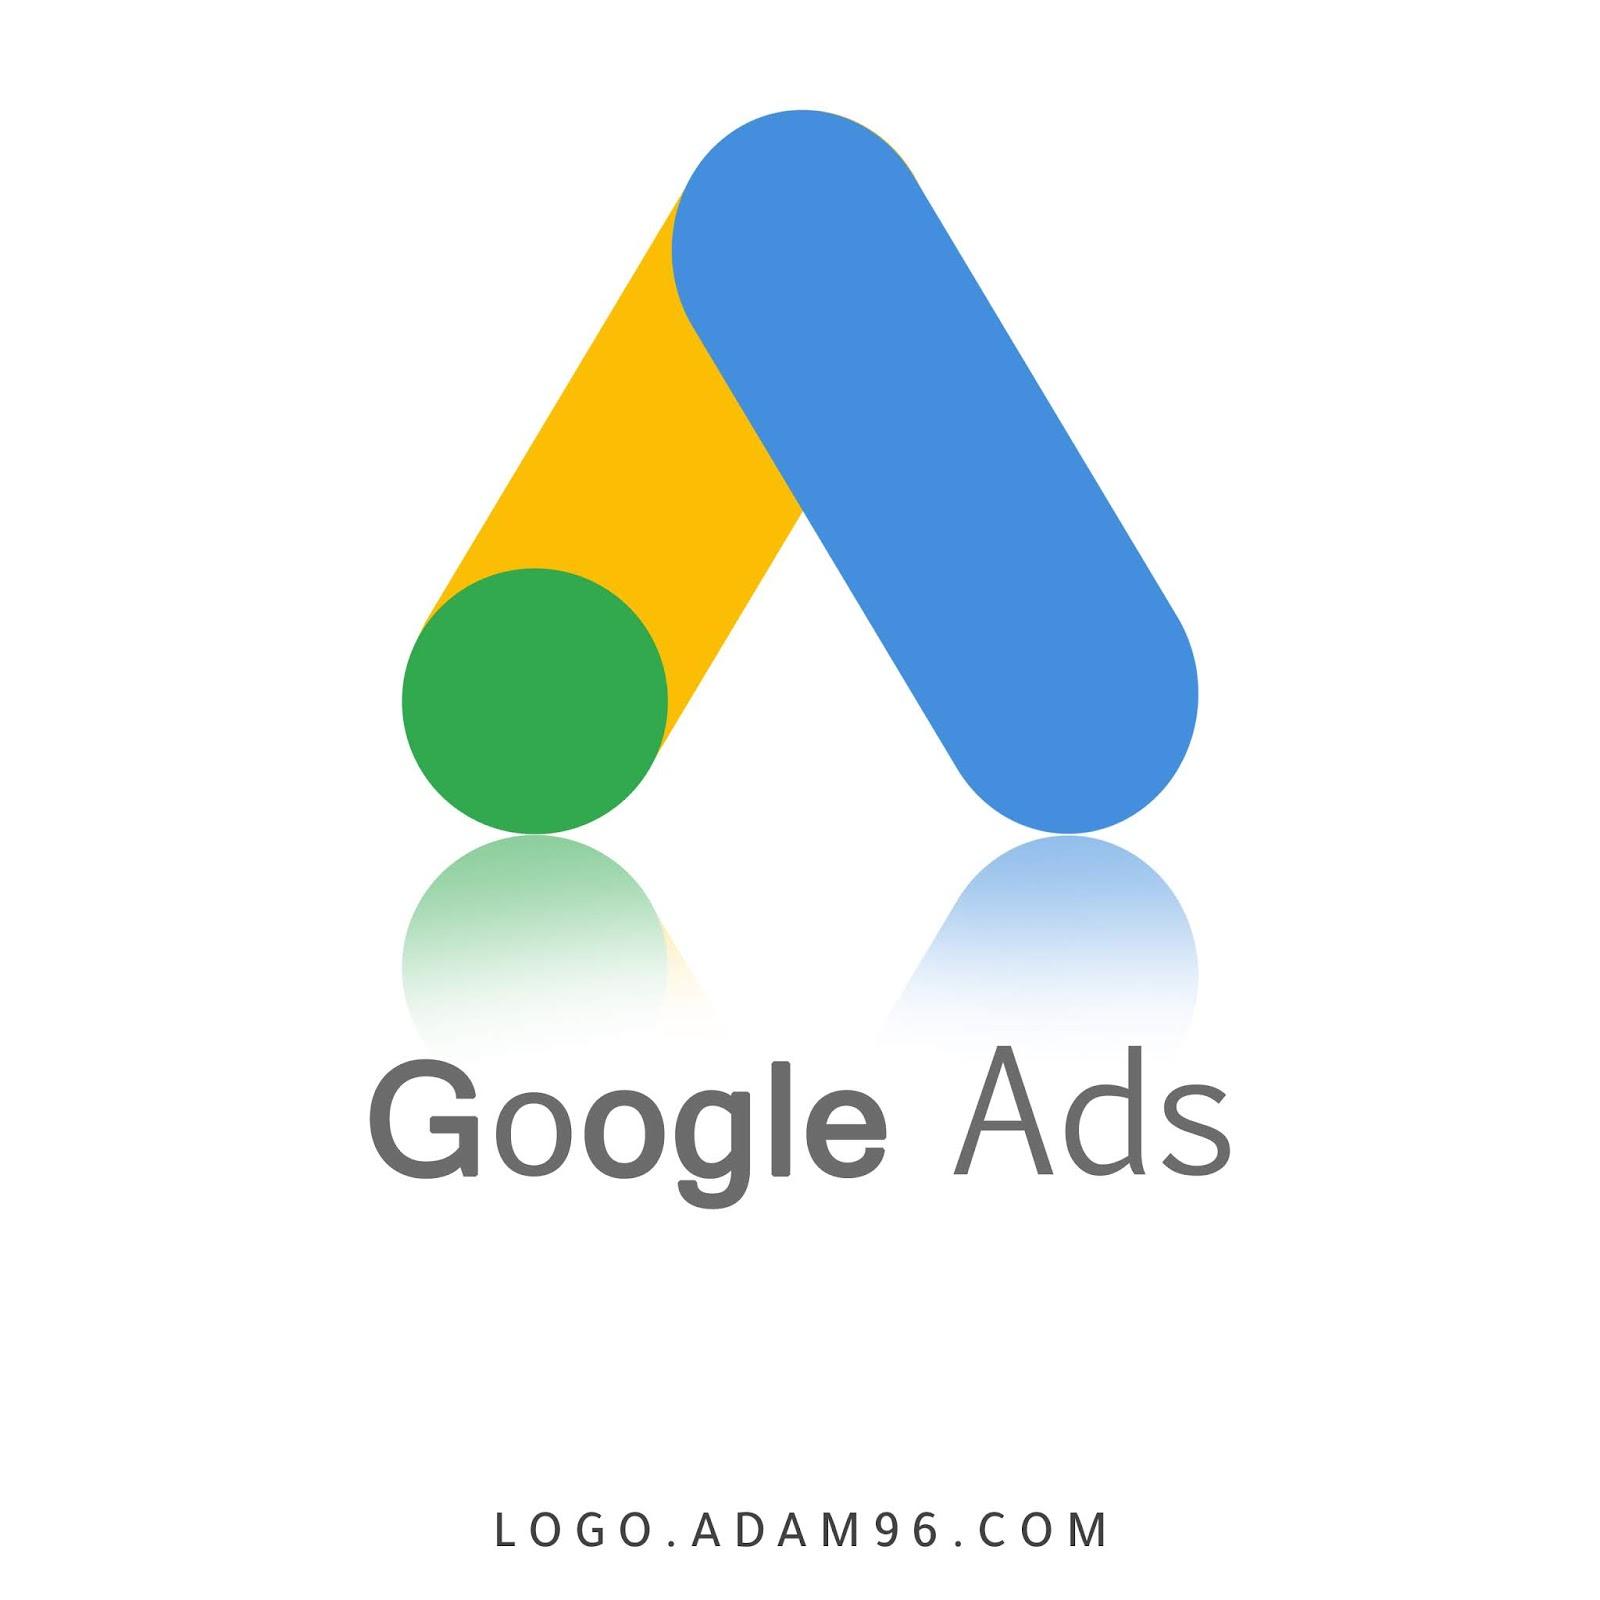 تحميل شعار جوجل أدووردز | Logo Google Ads